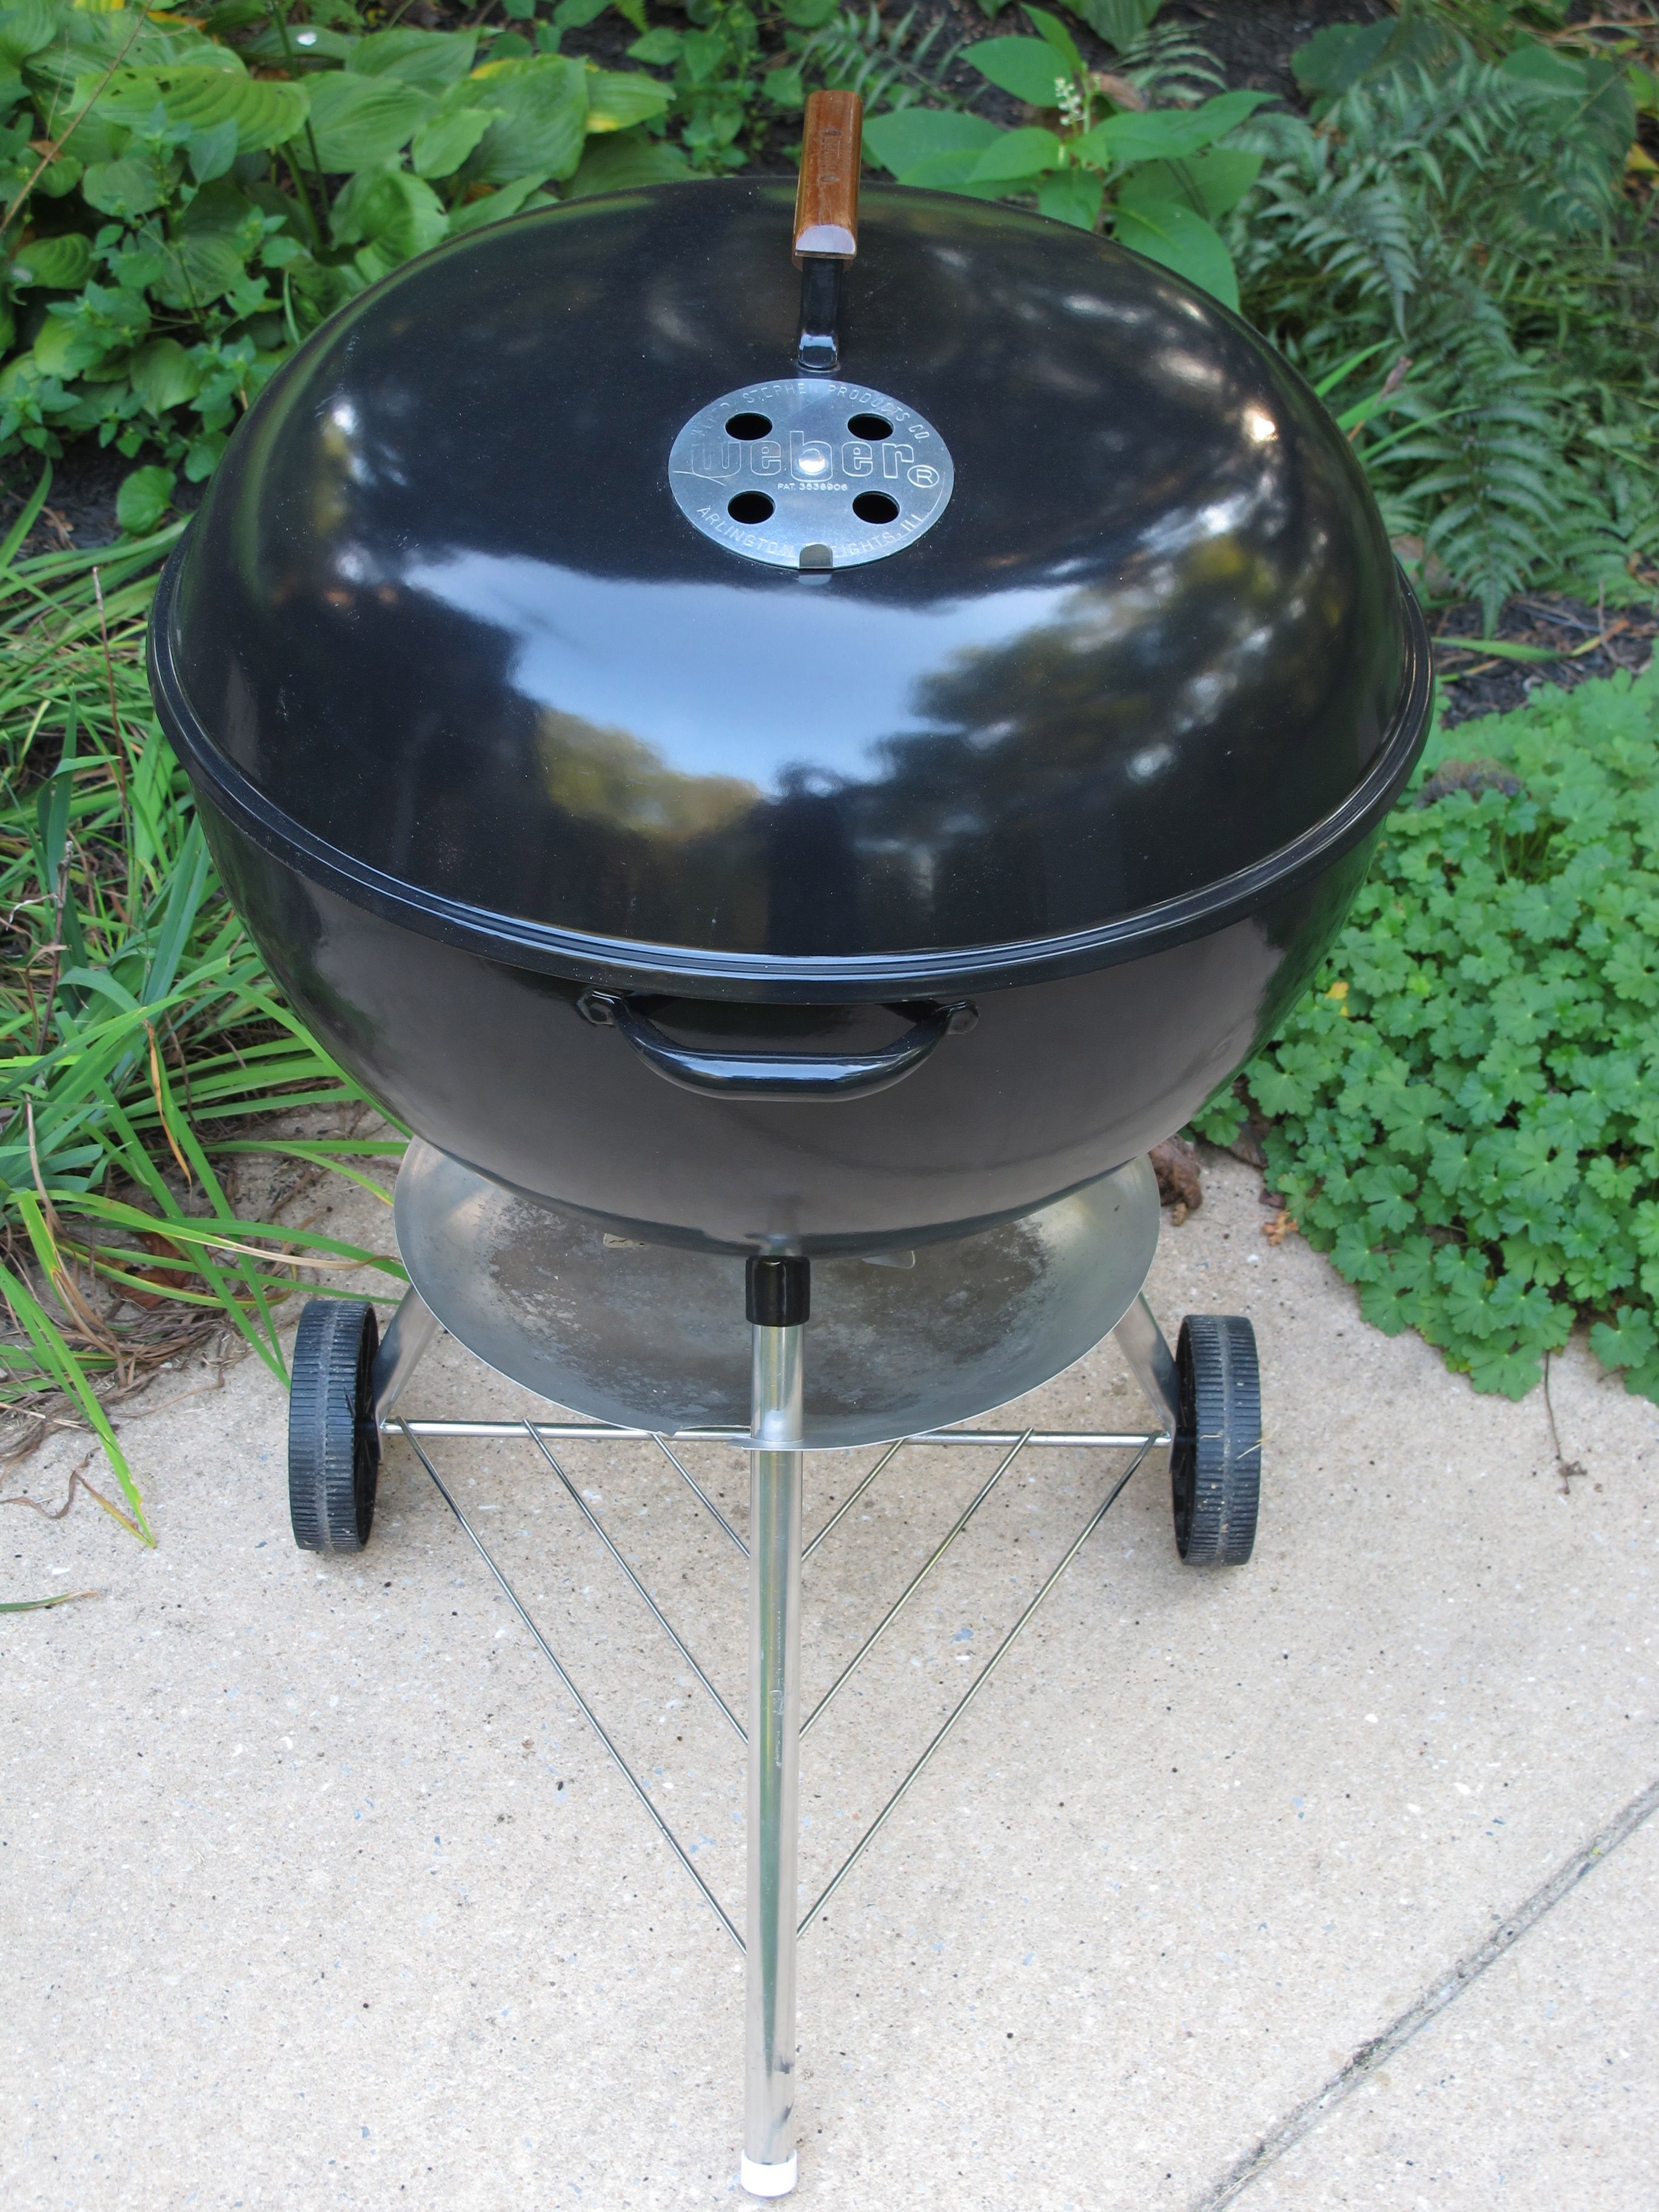 1976 77 22 5 Weber Kettle Grill Kettle Grills Weber Kettle Grilling